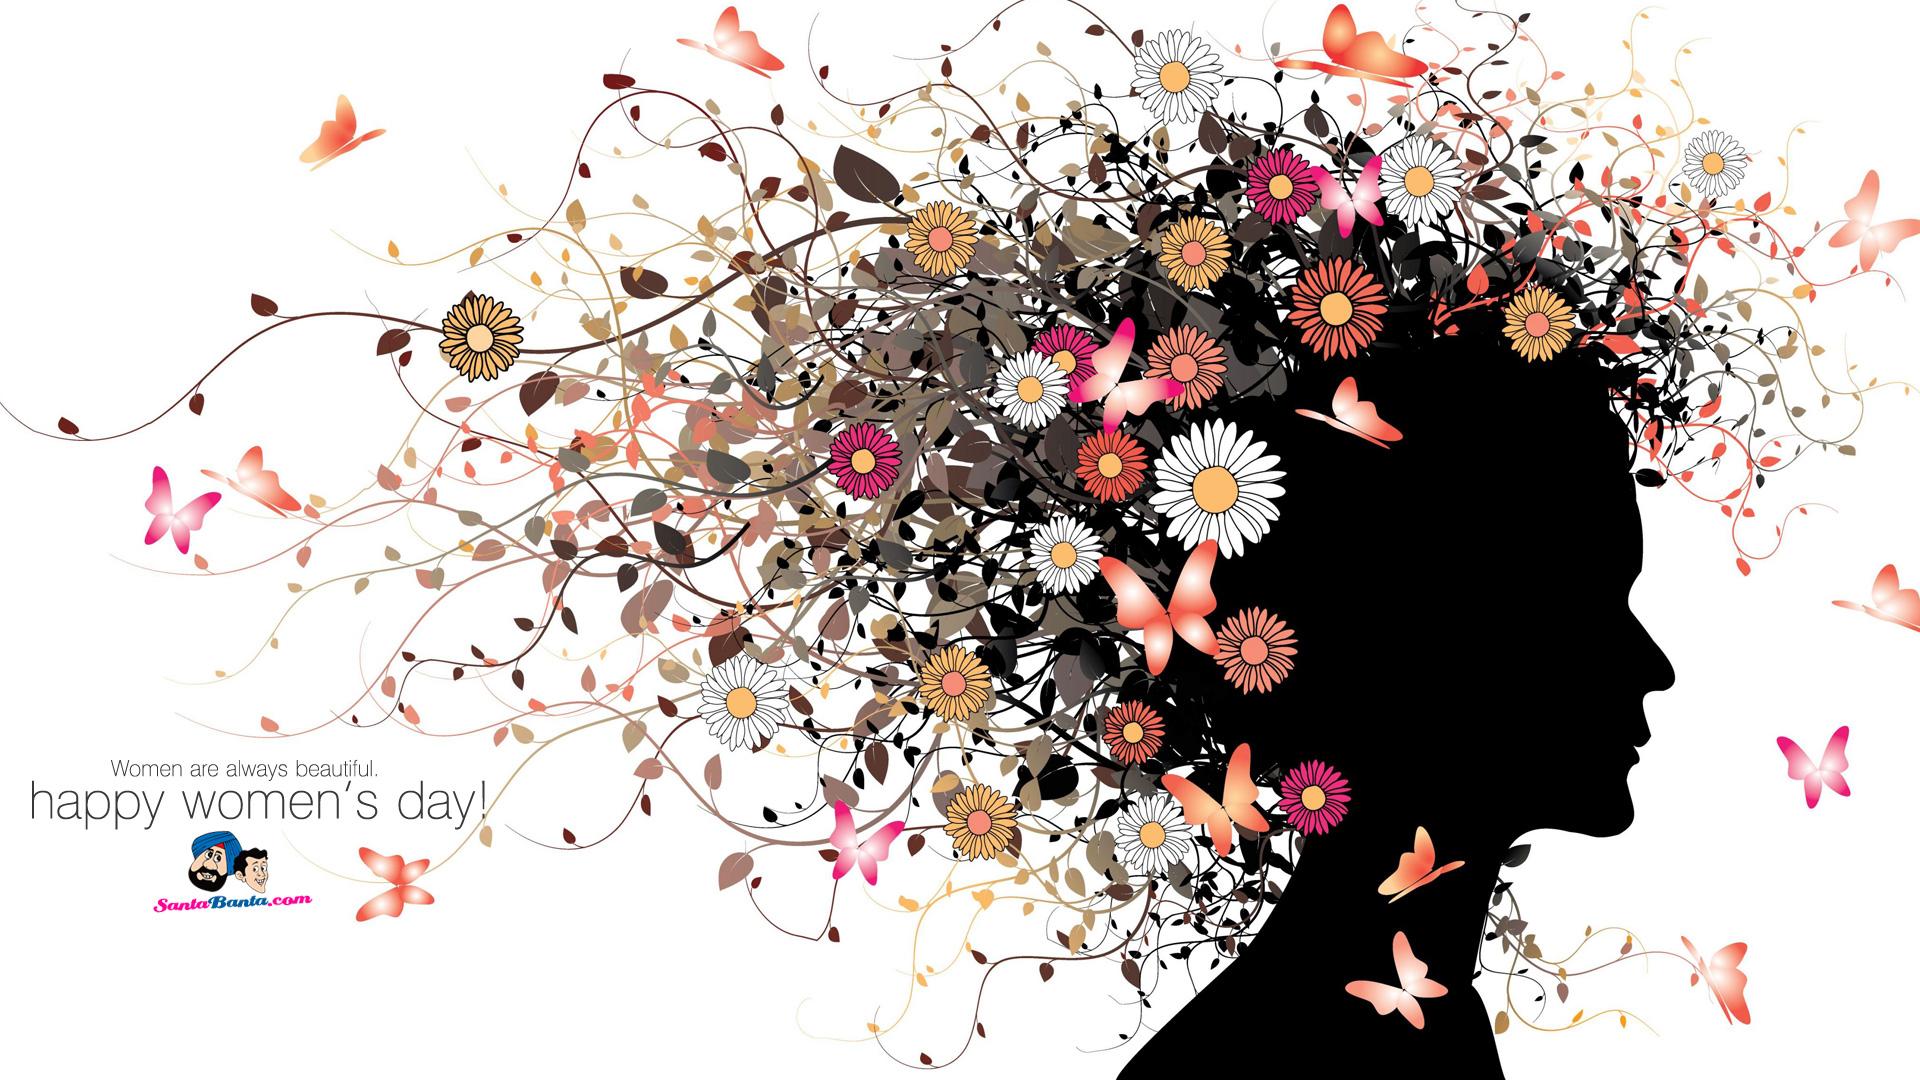 2012 International Women's Day - Happy Women's Day Fashion , HD Wallpaper & Backgrounds